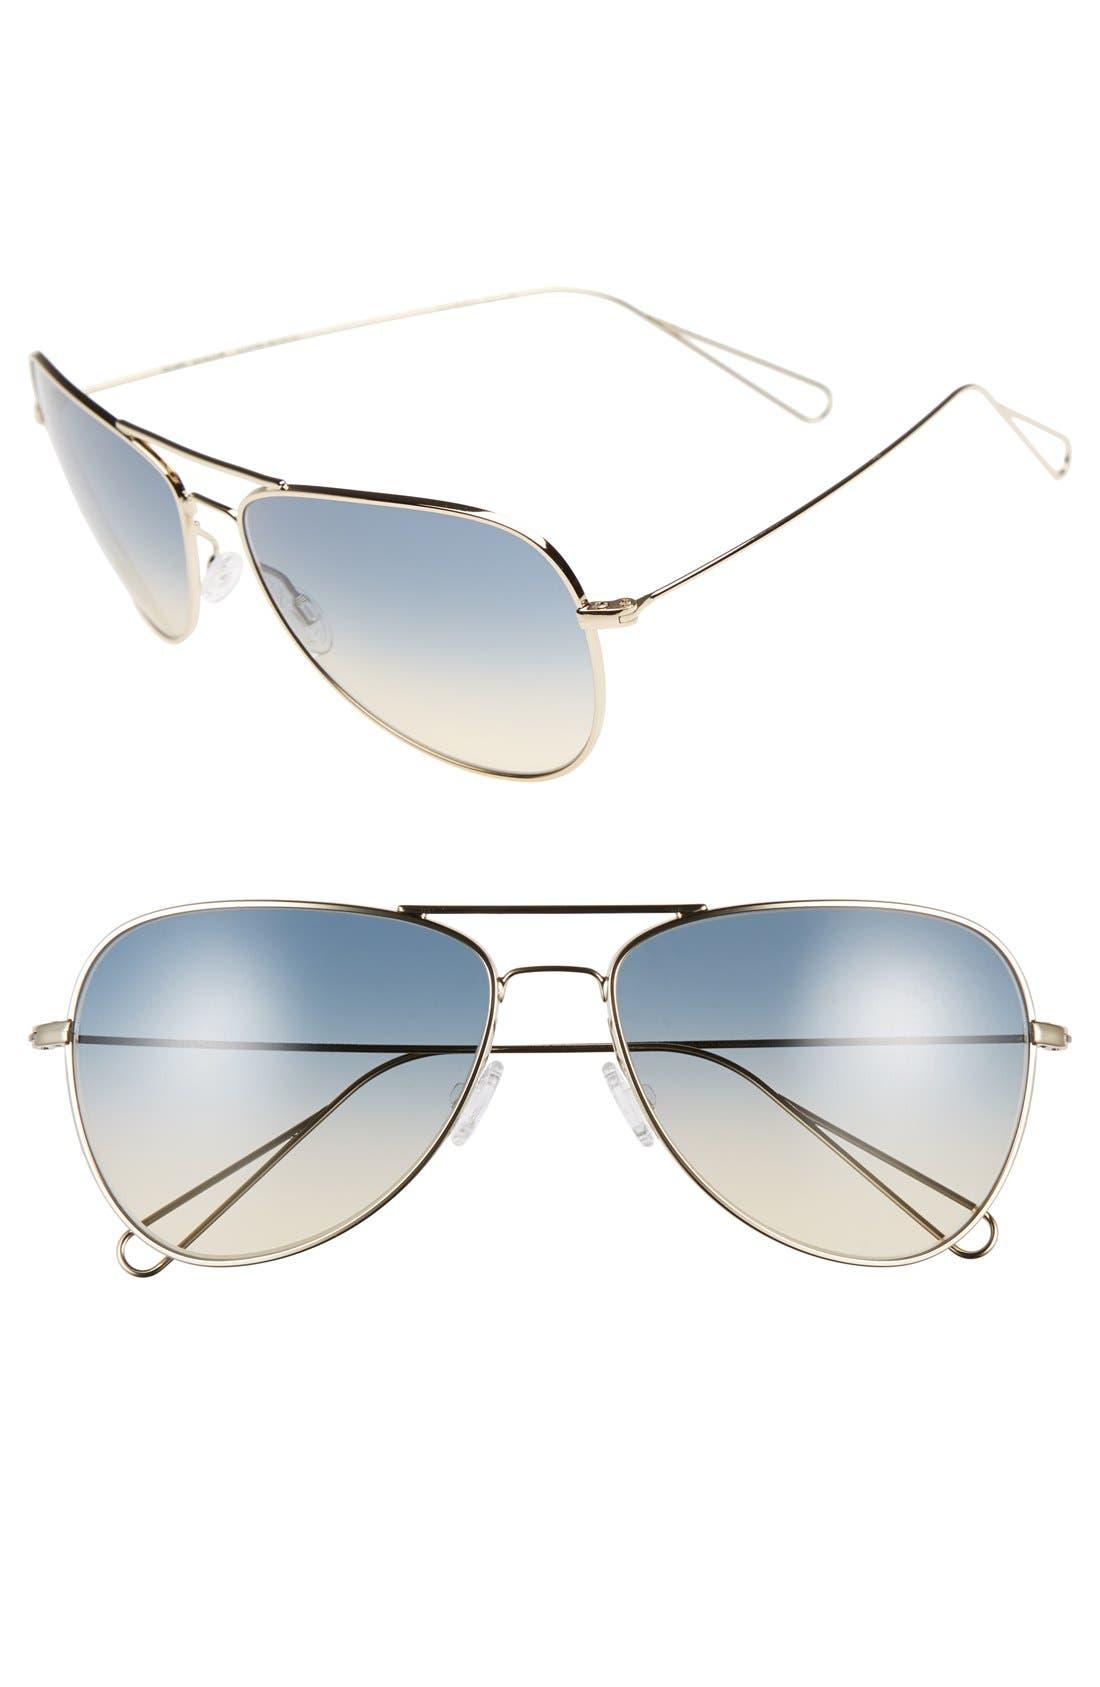 Main Image - Oliver Peoples x Isabel Marant 'Matt' 60mm Aviator Sunglasses